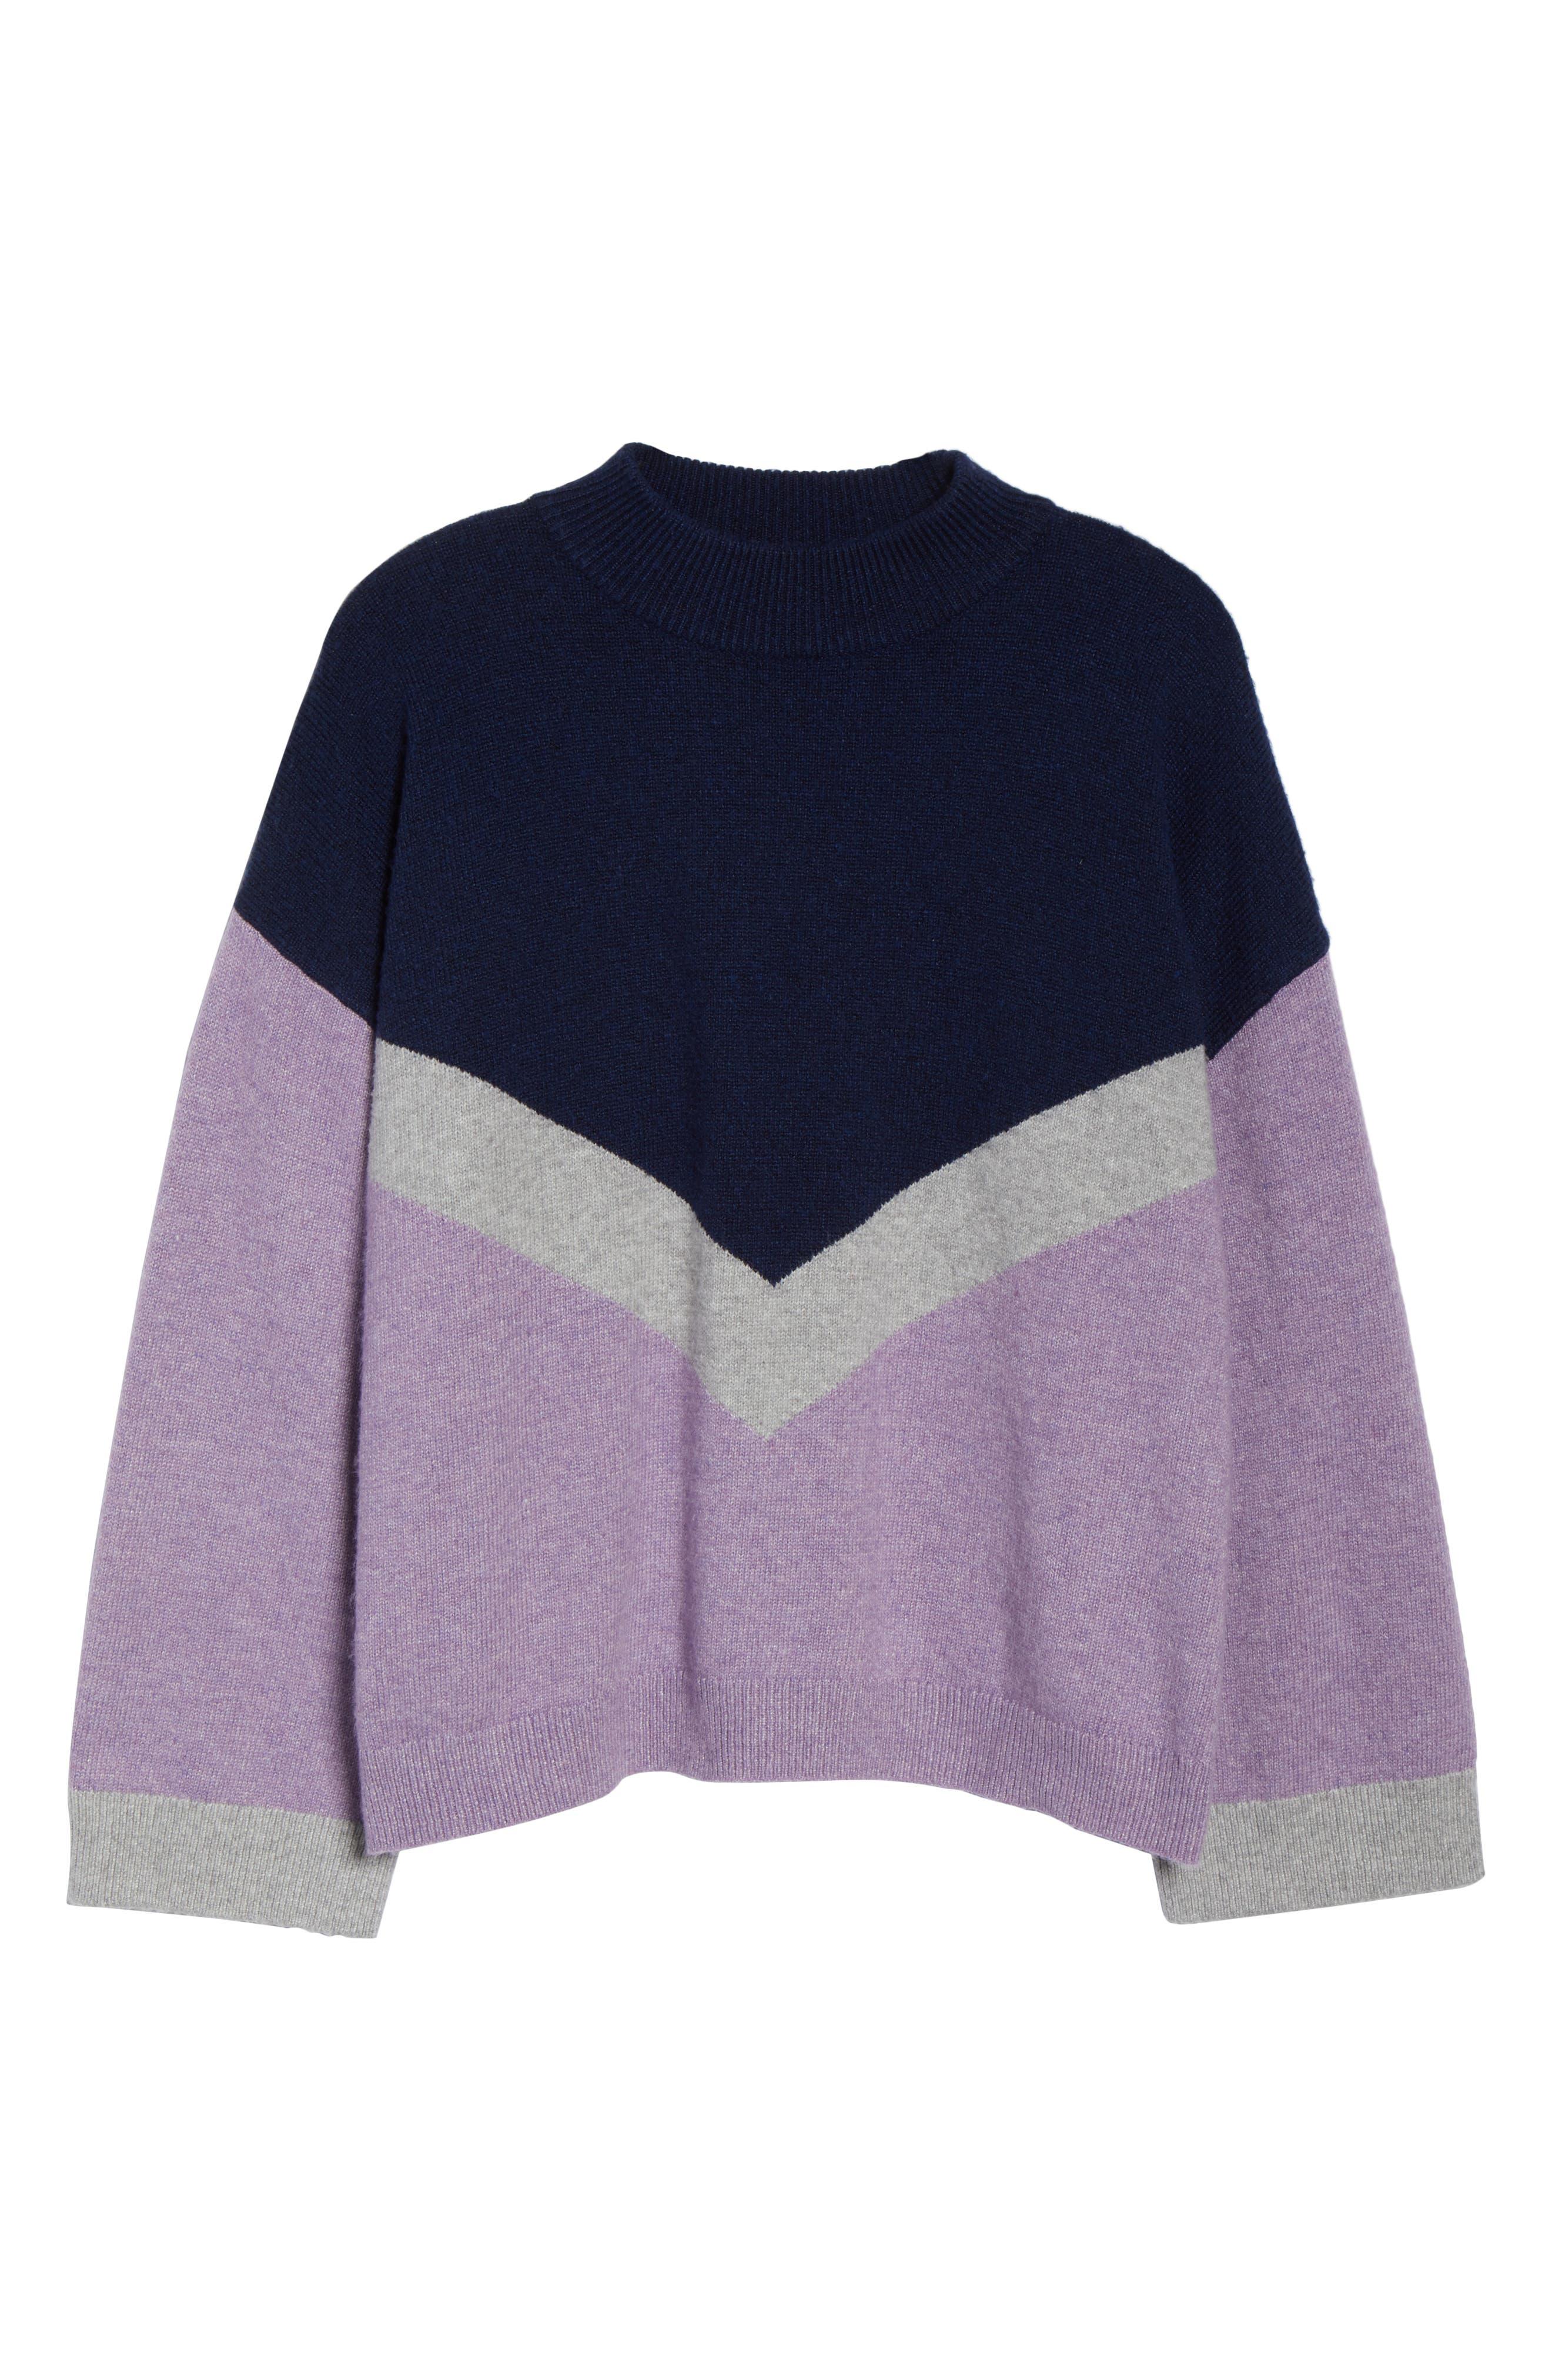 Chevron Stripe Sweater,                             Alternate thumbnail 6, color,                             PURPLE WAVE CHALET